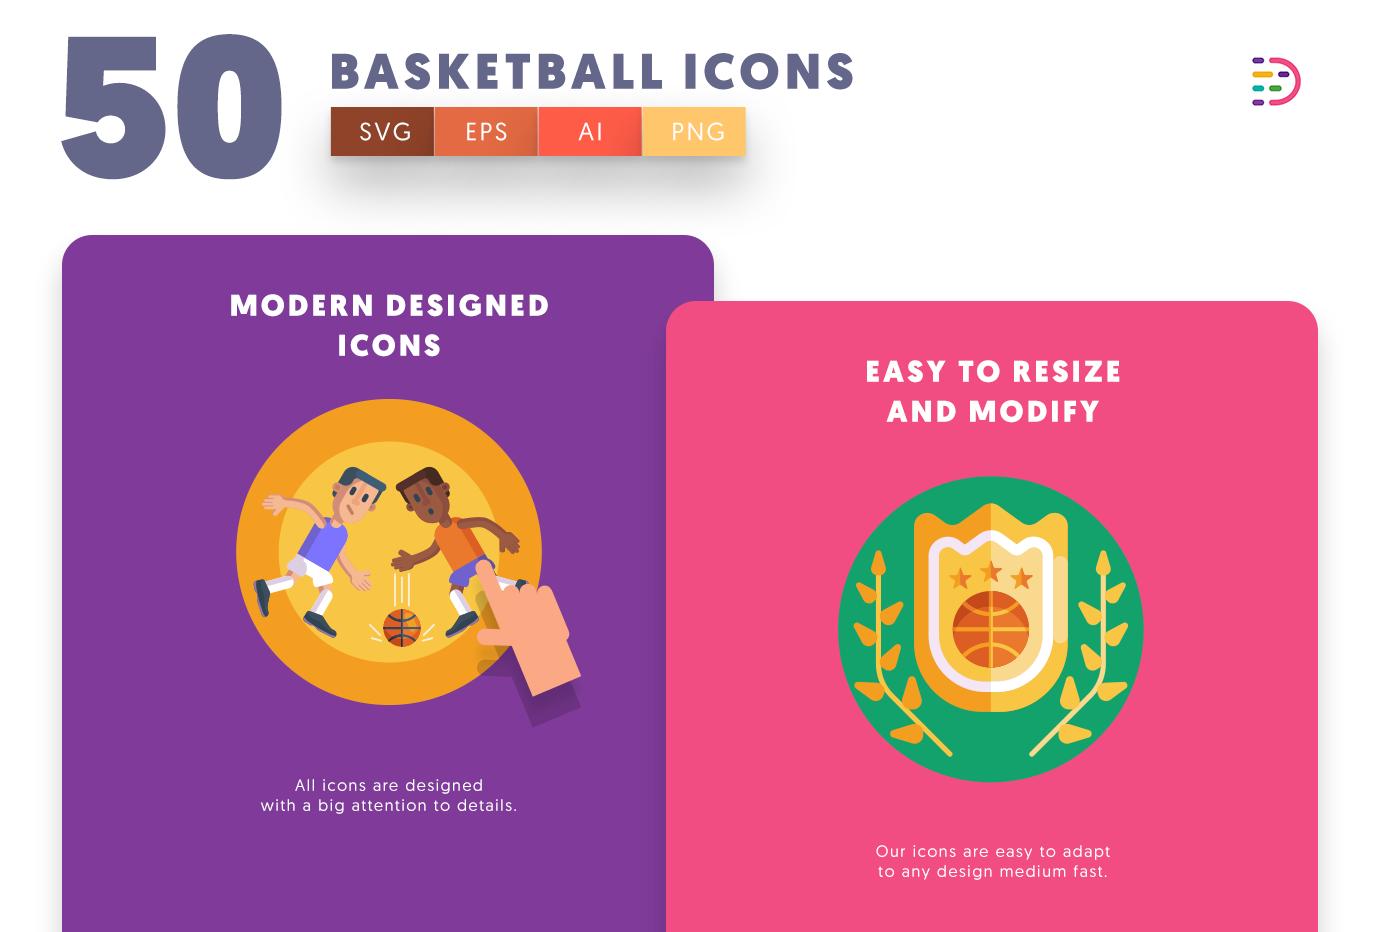 Basketball icons png/svg/eps